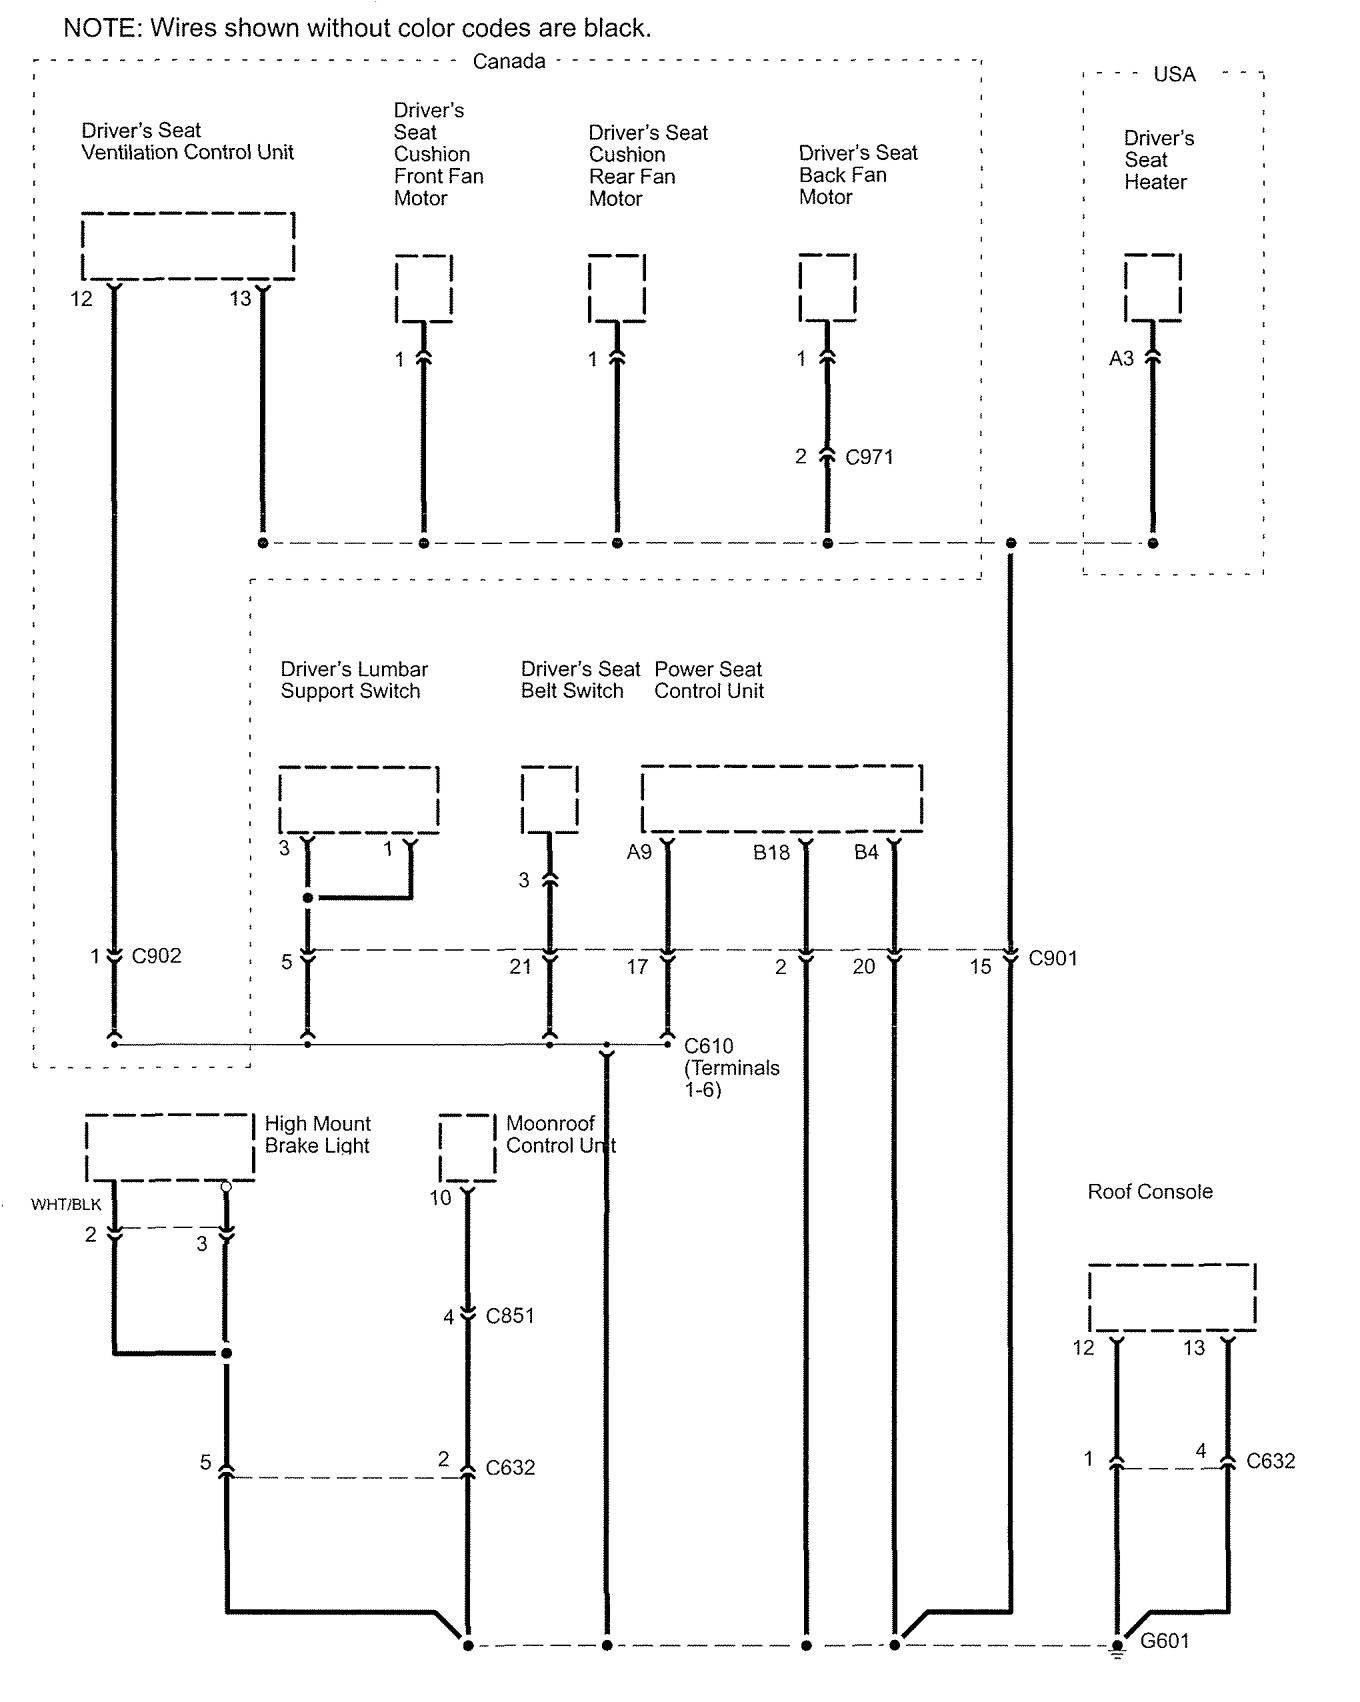 Nuheat wiring diagram thermostat